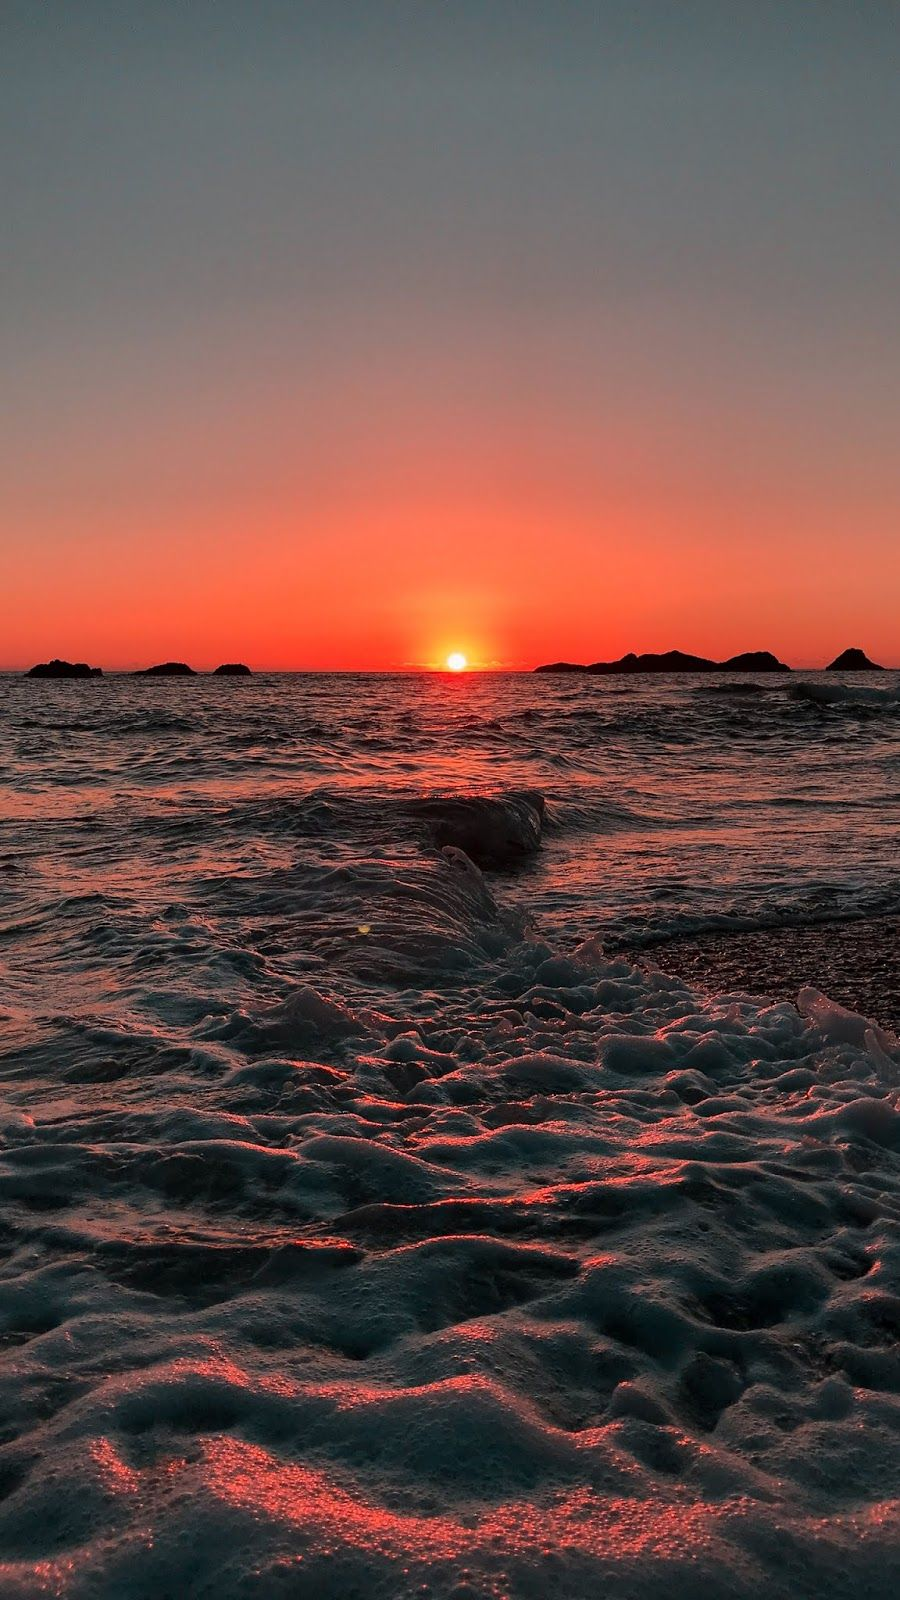 Beach sunset android wallpaper la naturaleza Fondos 900x1600